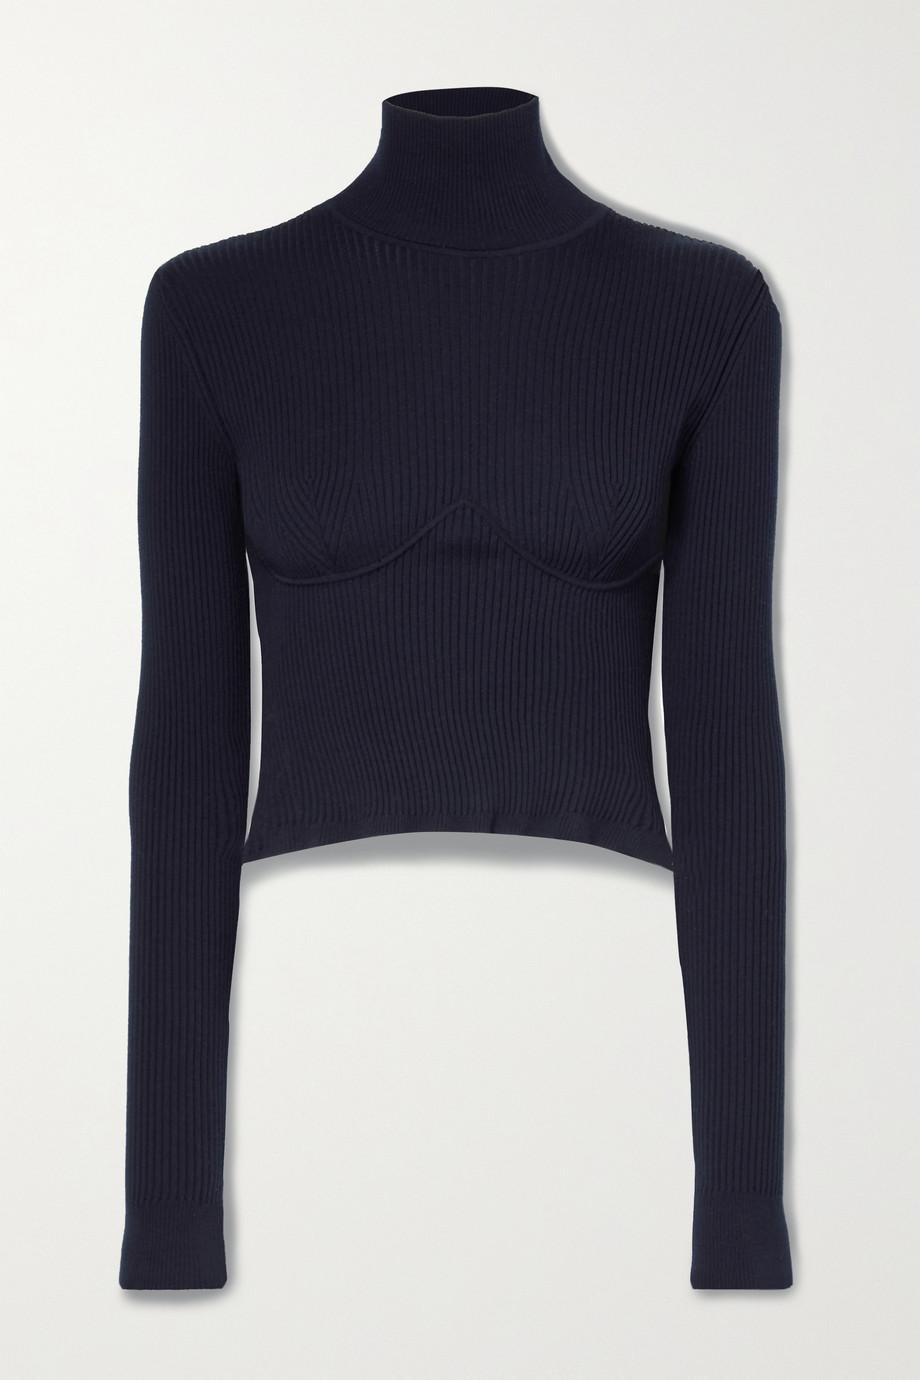 Gabriela Hearst Russel cropped ribbed merino wool turtleneck sweater